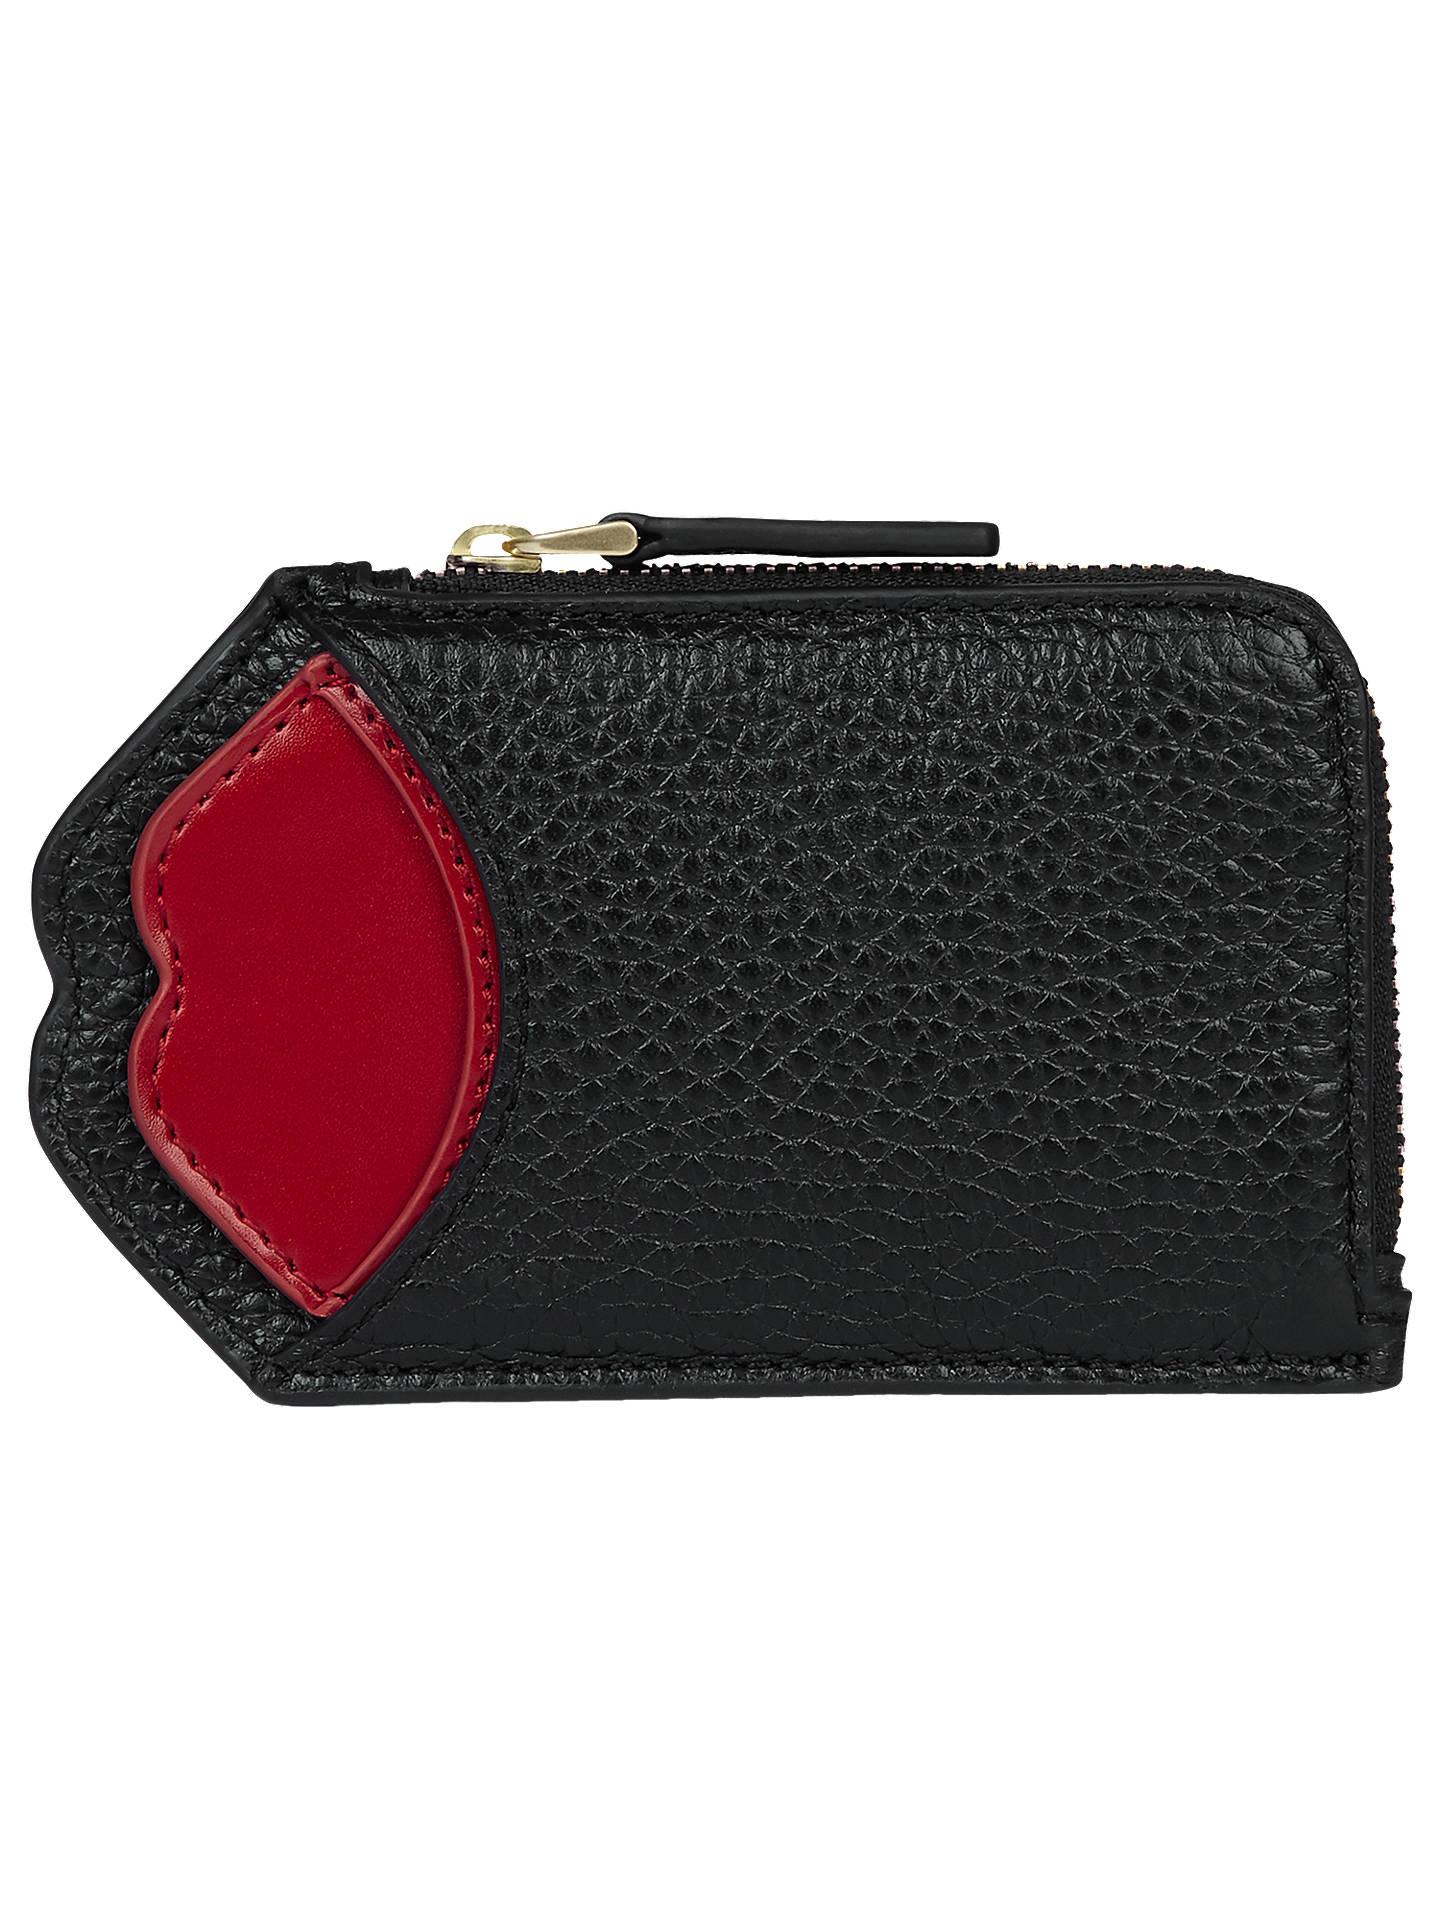 0d07c3e8768b0 Buy Lulu Guinness Pop Up Lip Liliana Leather Purse